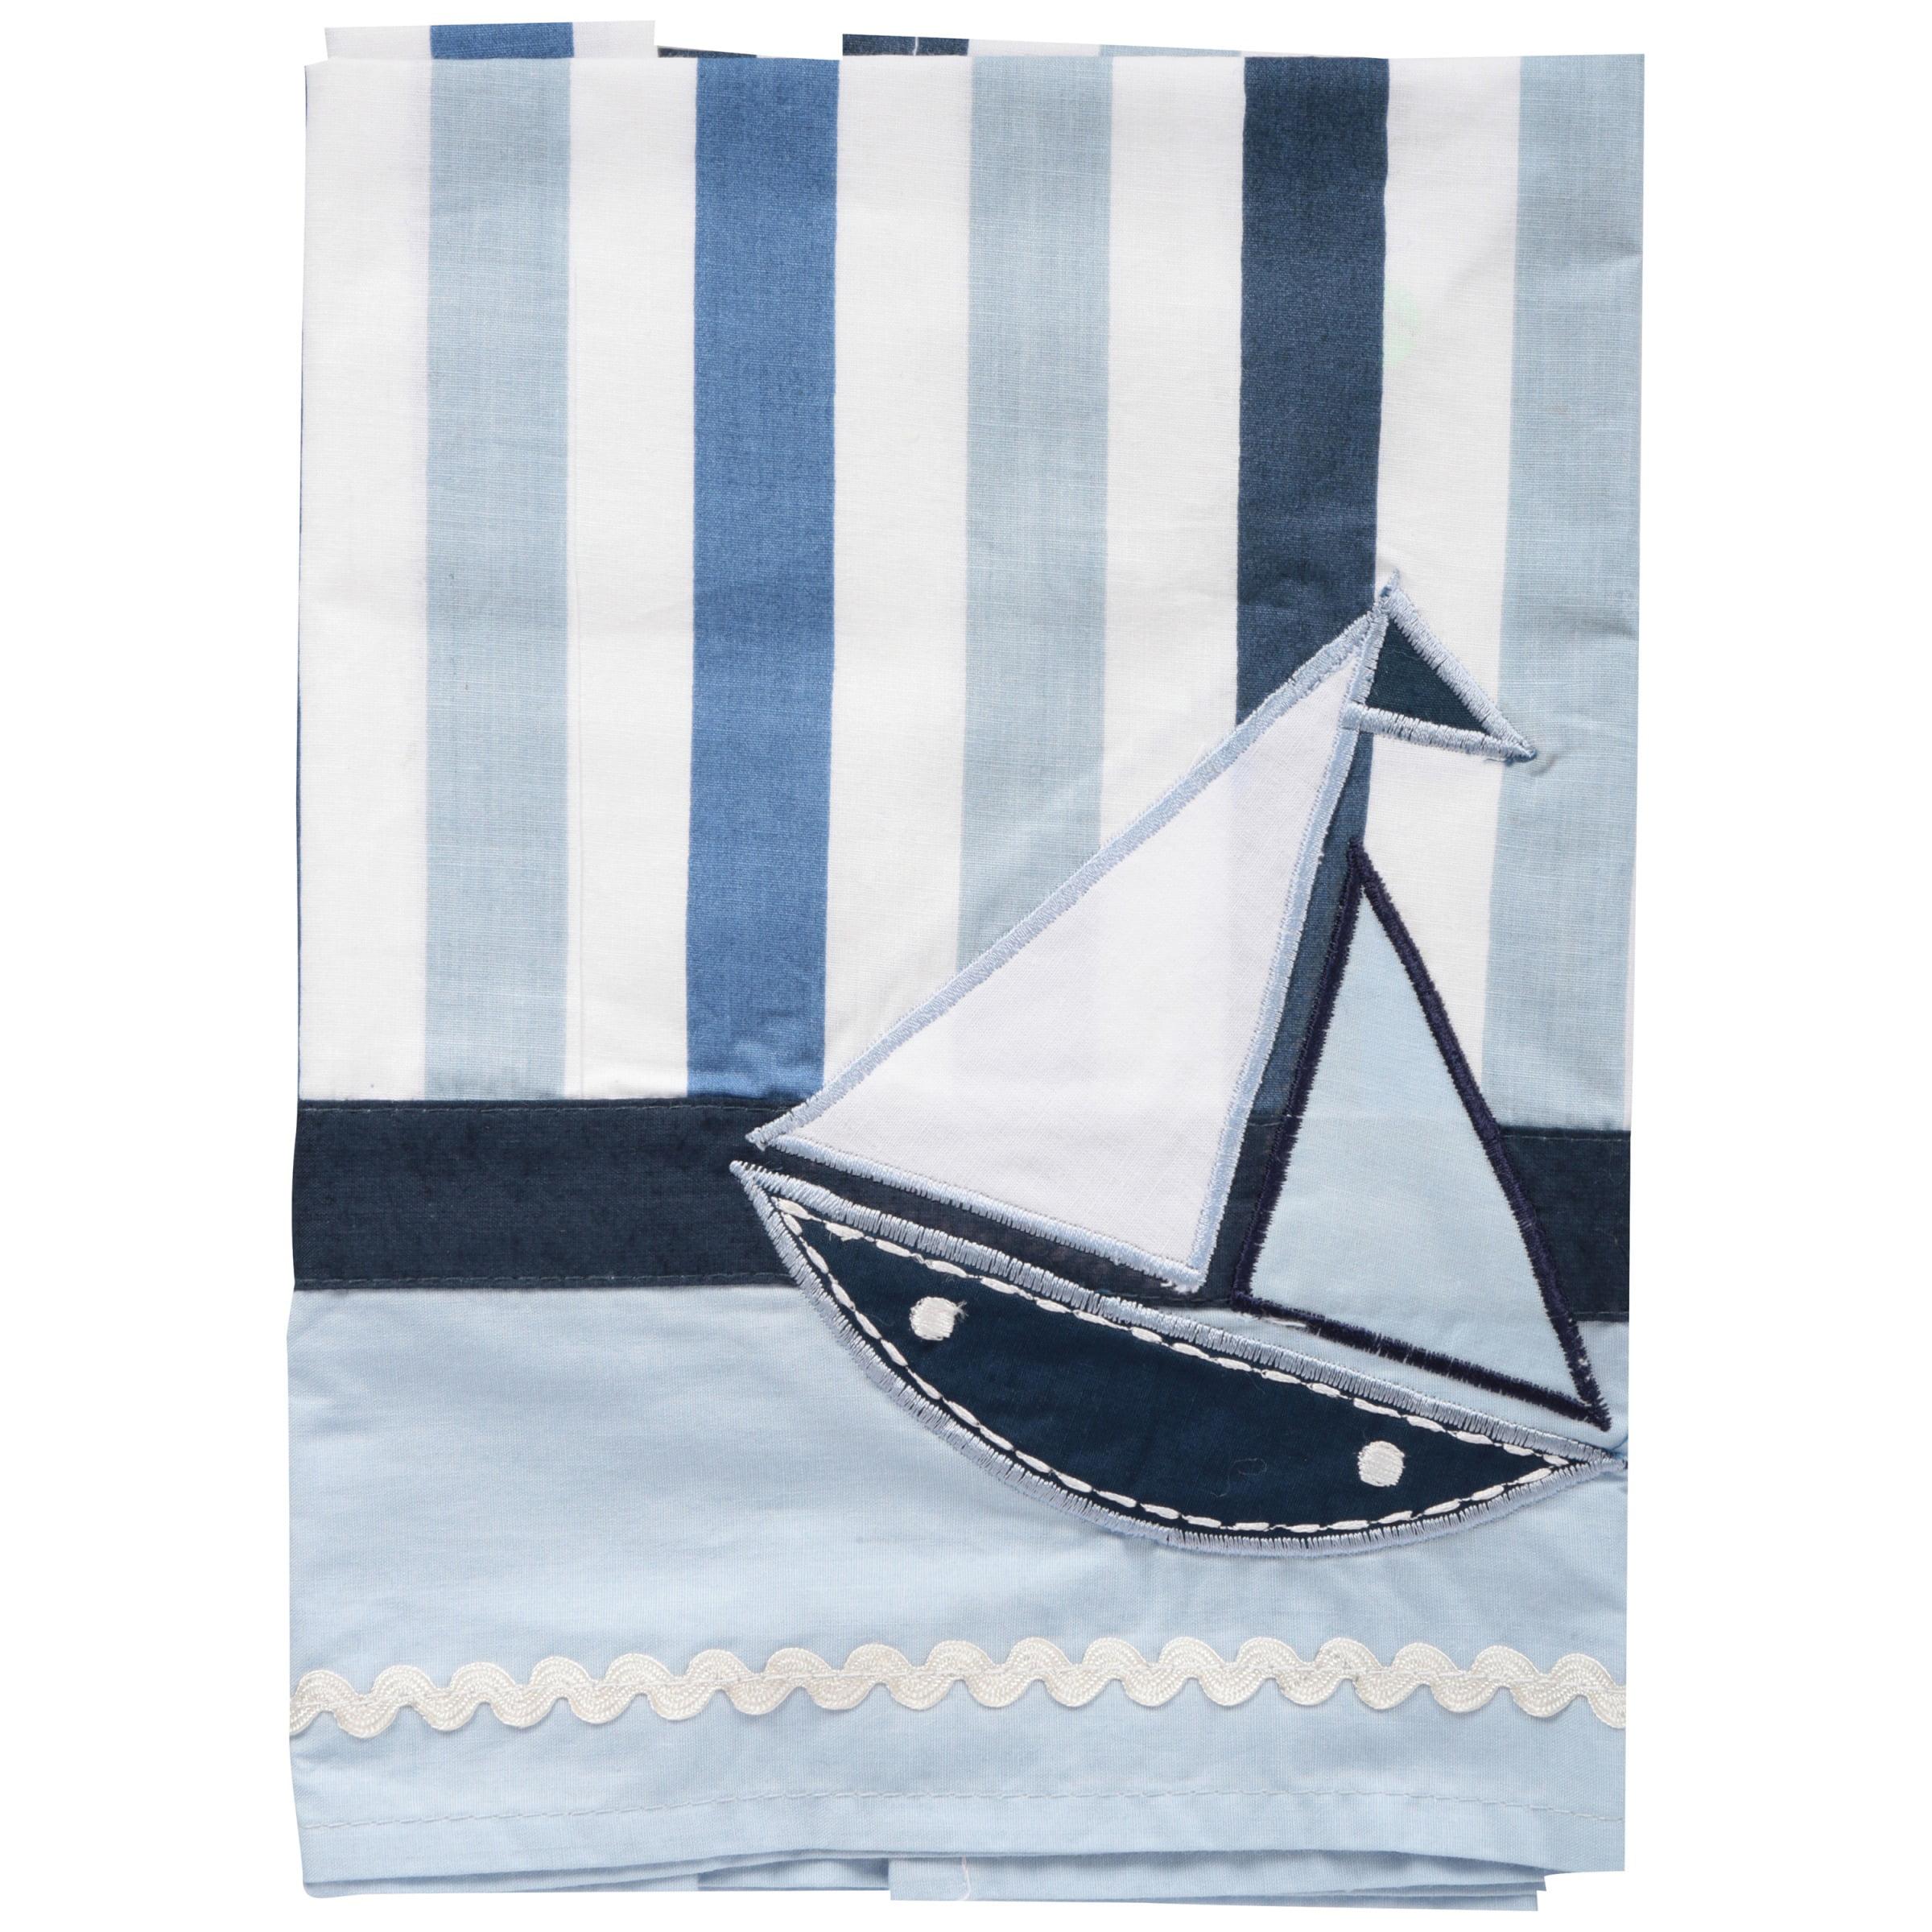 Bacati Window Valance Little Sailor, 1.0 CT by Bacati